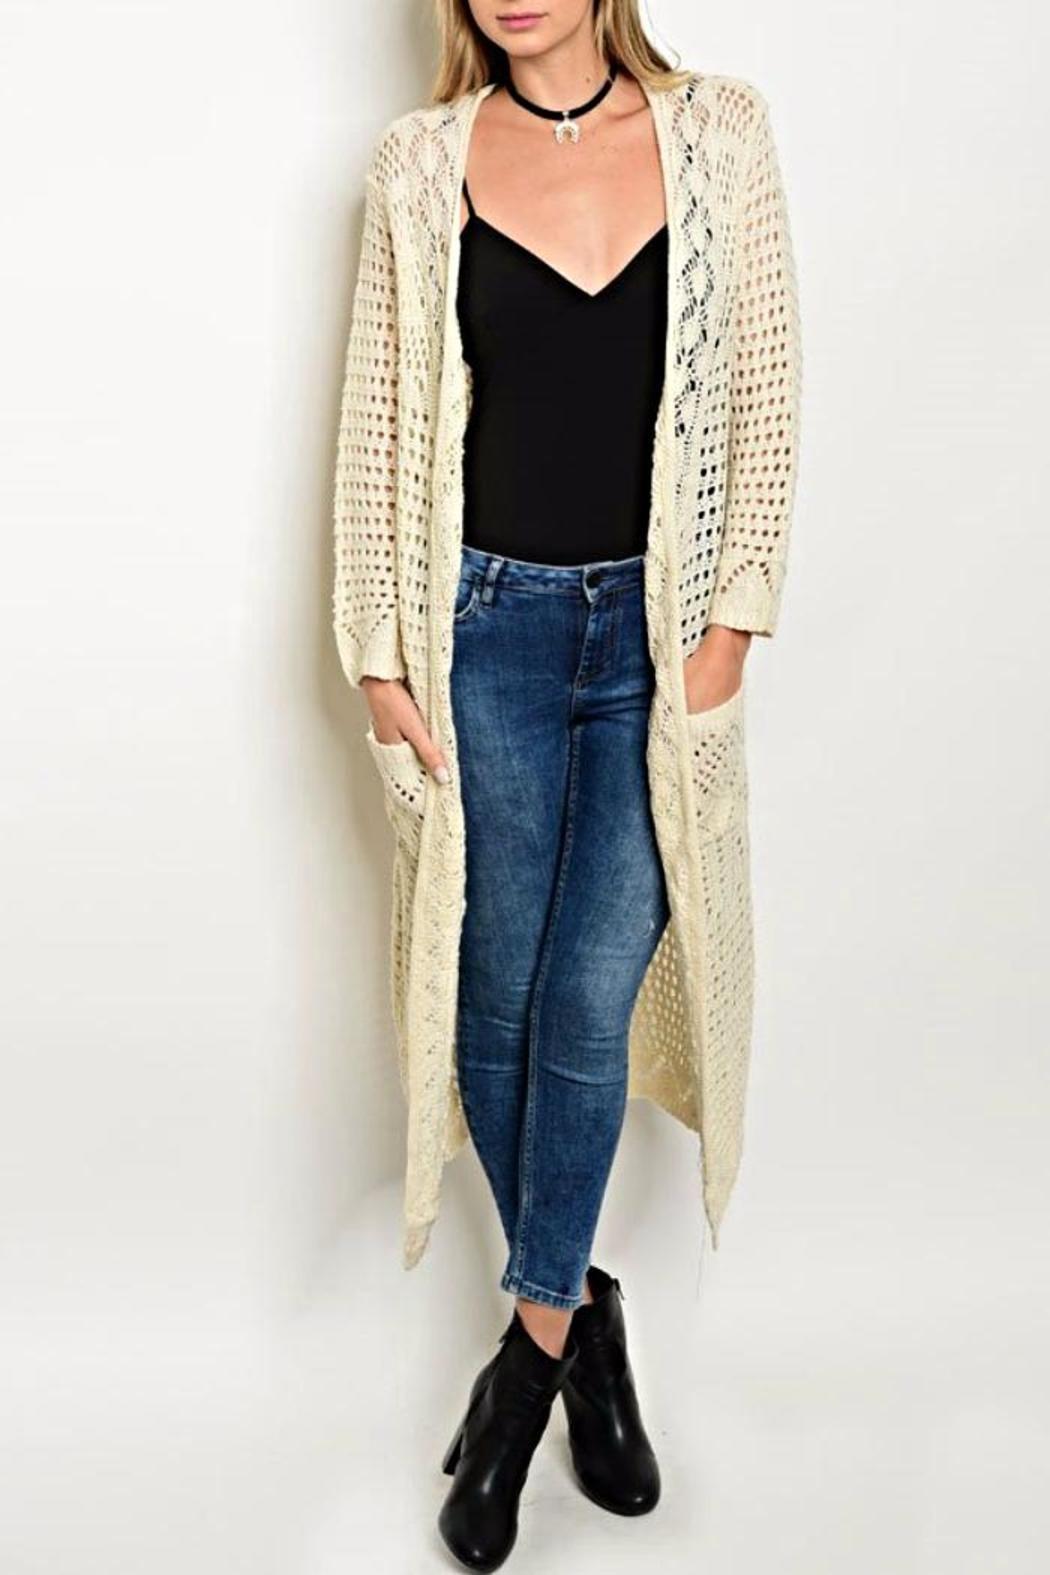 Sans Souci Cream Crochet Cardigan | Long cardigan